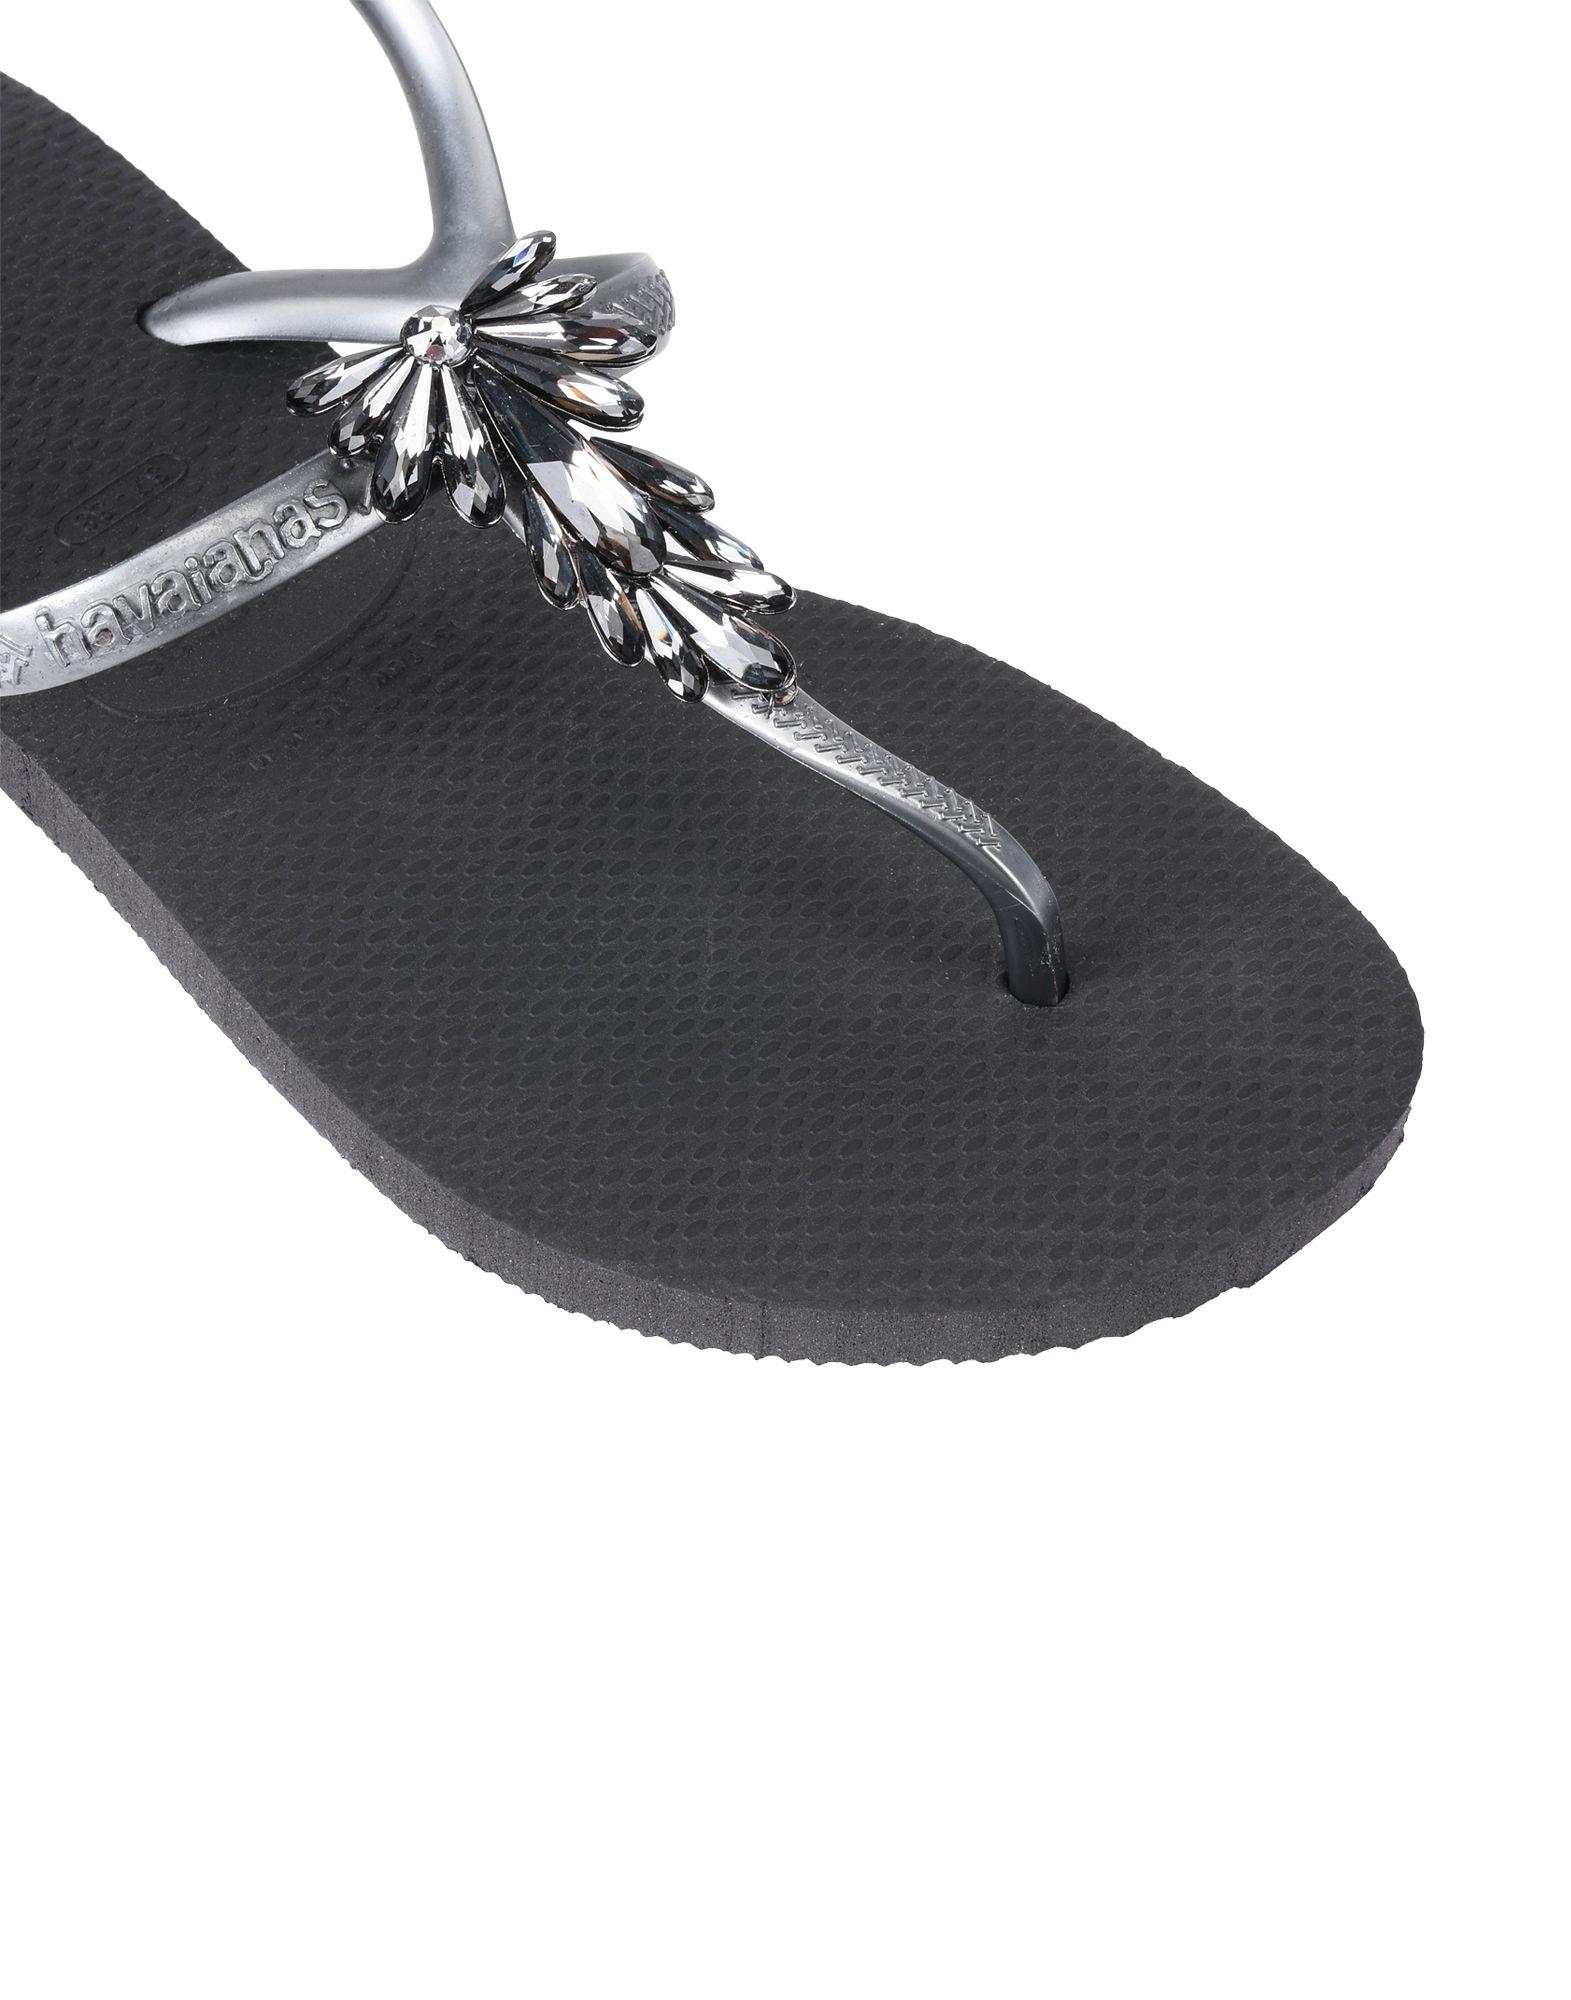 Havaianas 11496851CL Dianetten Damen  11496851CL Havaianas Heiße Schuhe 8adead